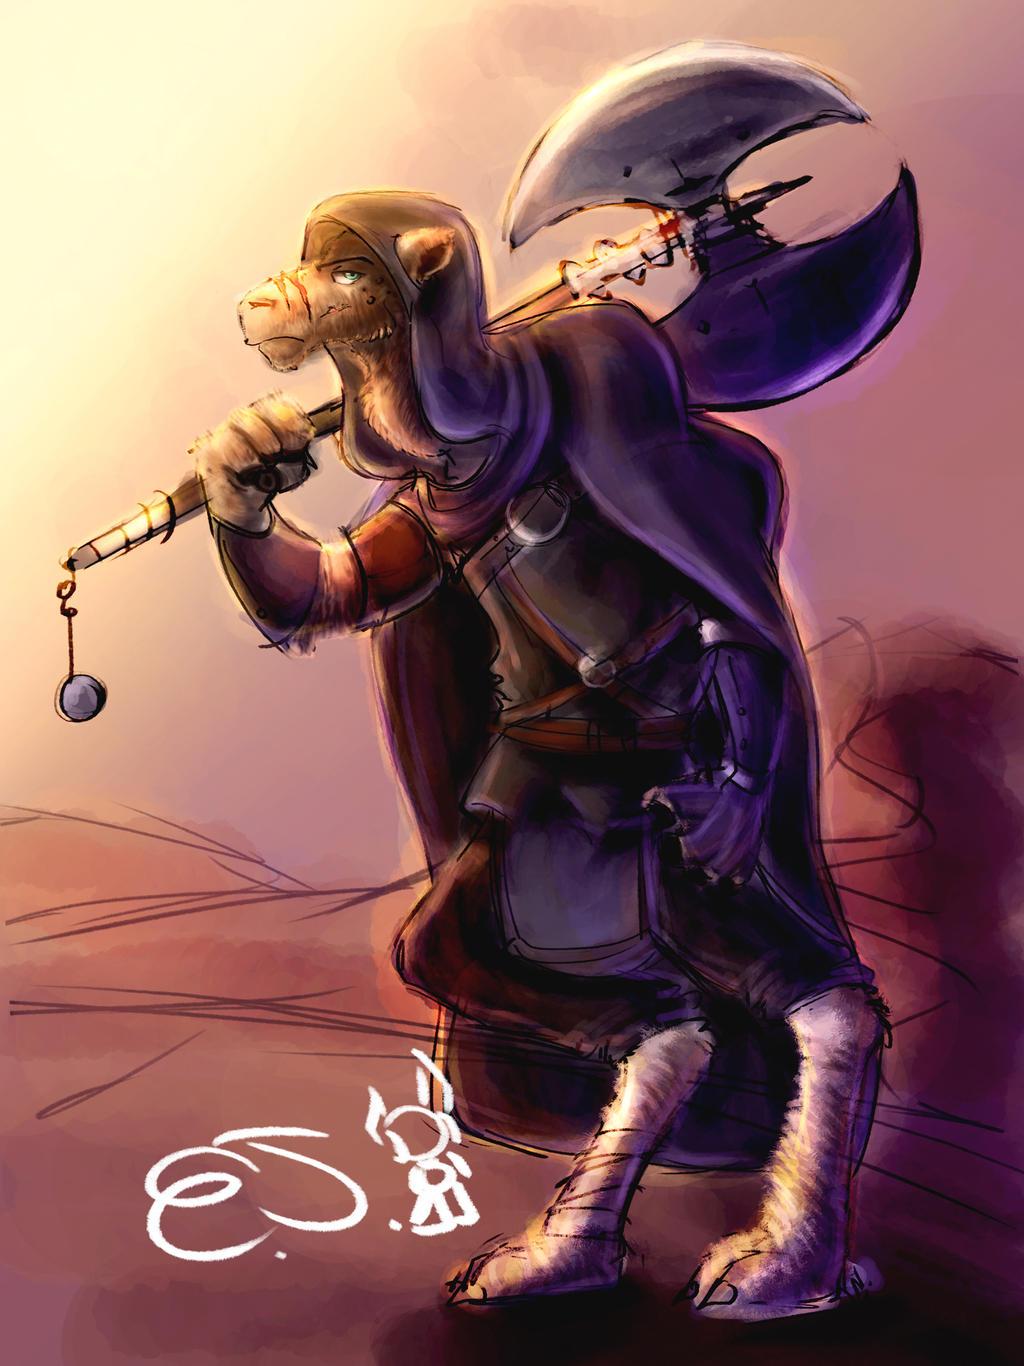 camel_character_commish_by_enjoliquej-d673oc2.jpg